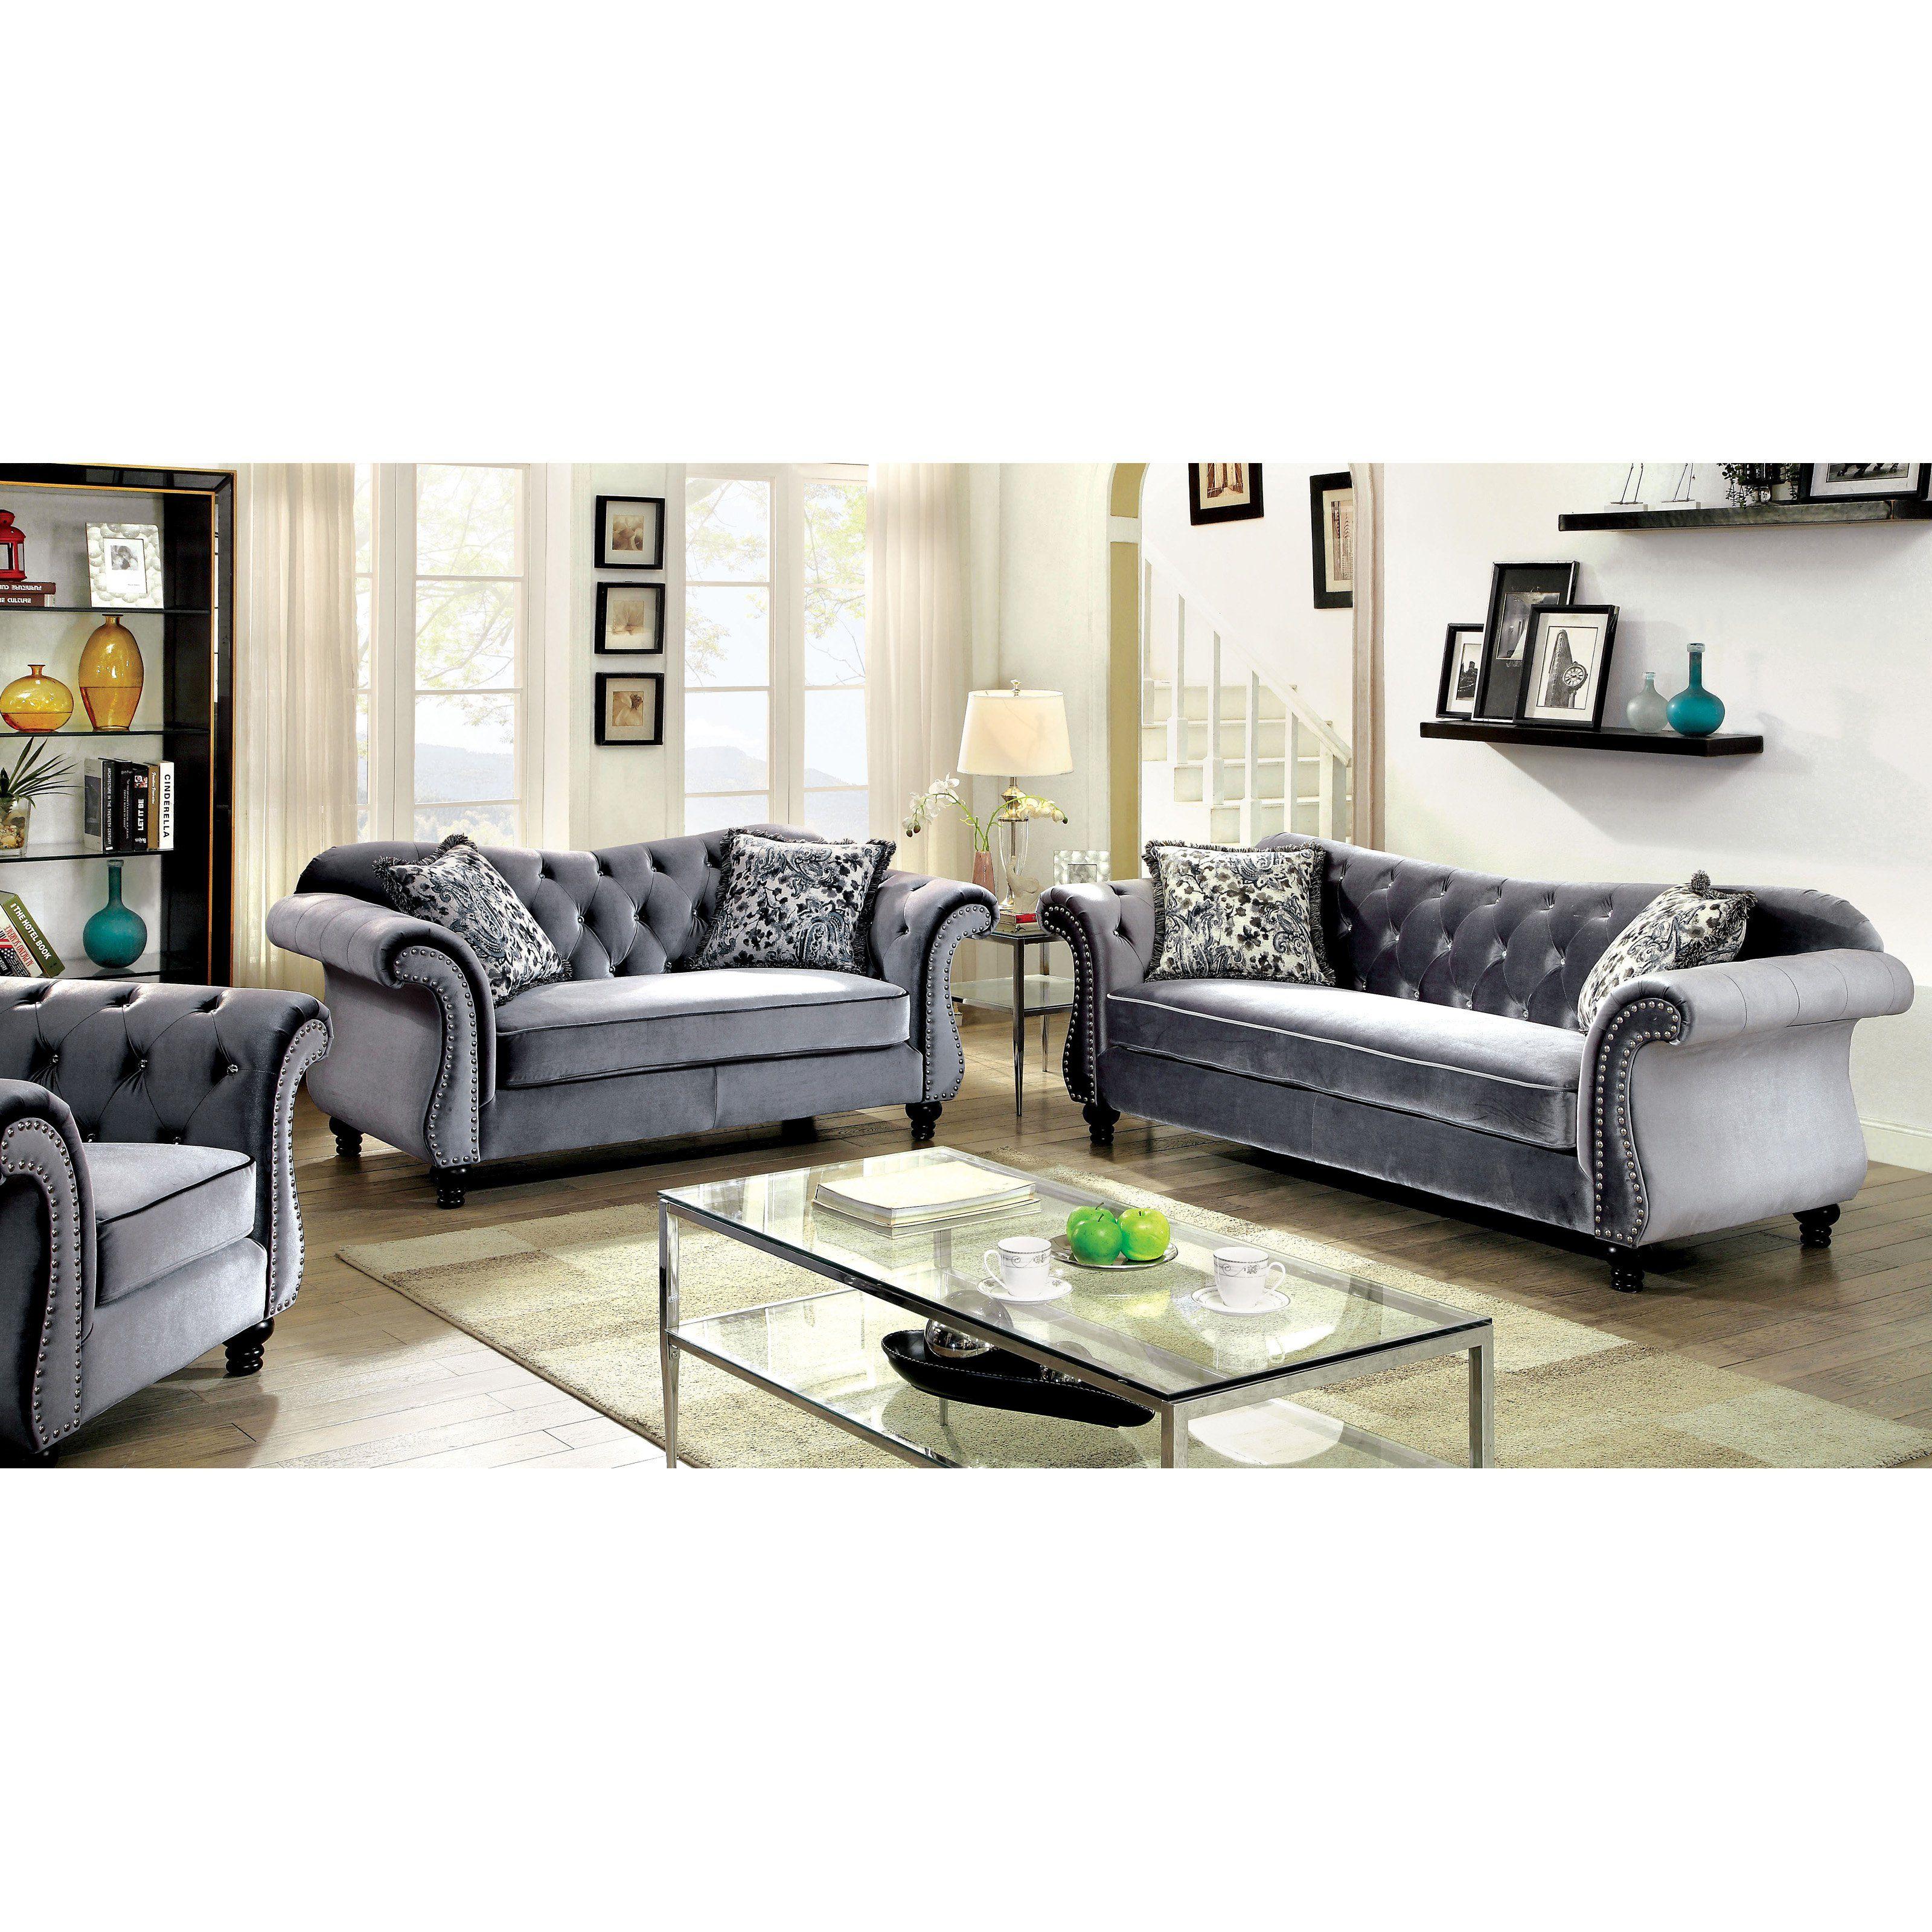 Furniture of America Ileyna 3 Piece Sofa Set - IDF-6159GY ...